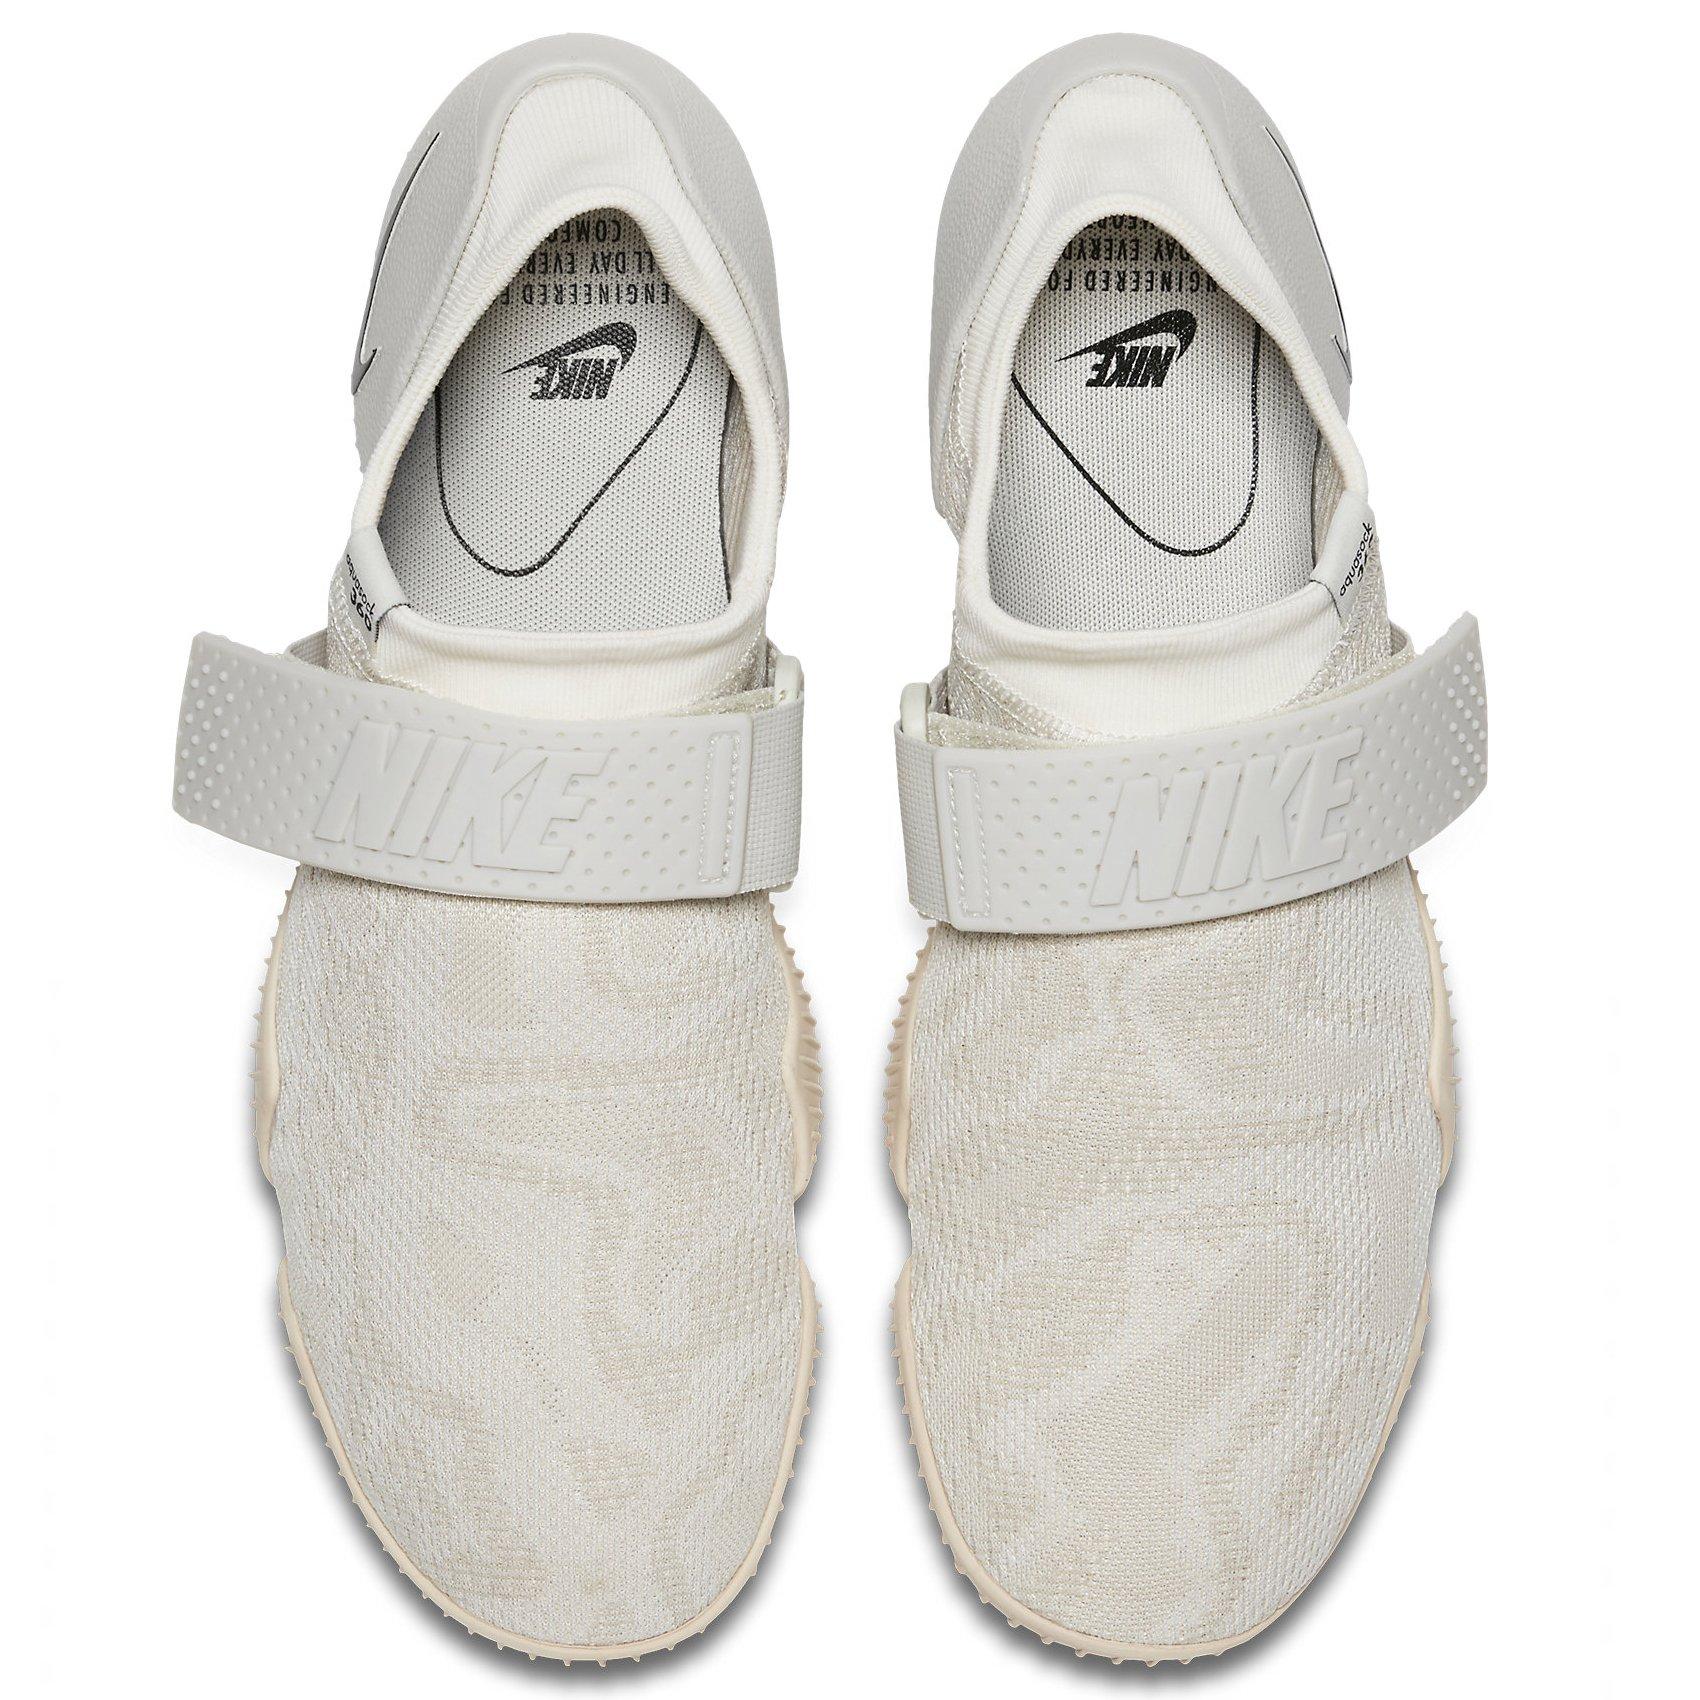 NIKE Aqua Sock 360 QS 902782 100 Oatmeal/Light Bone/Sail/Black Men's Water Shoes (8) by NIKE (Image #3)